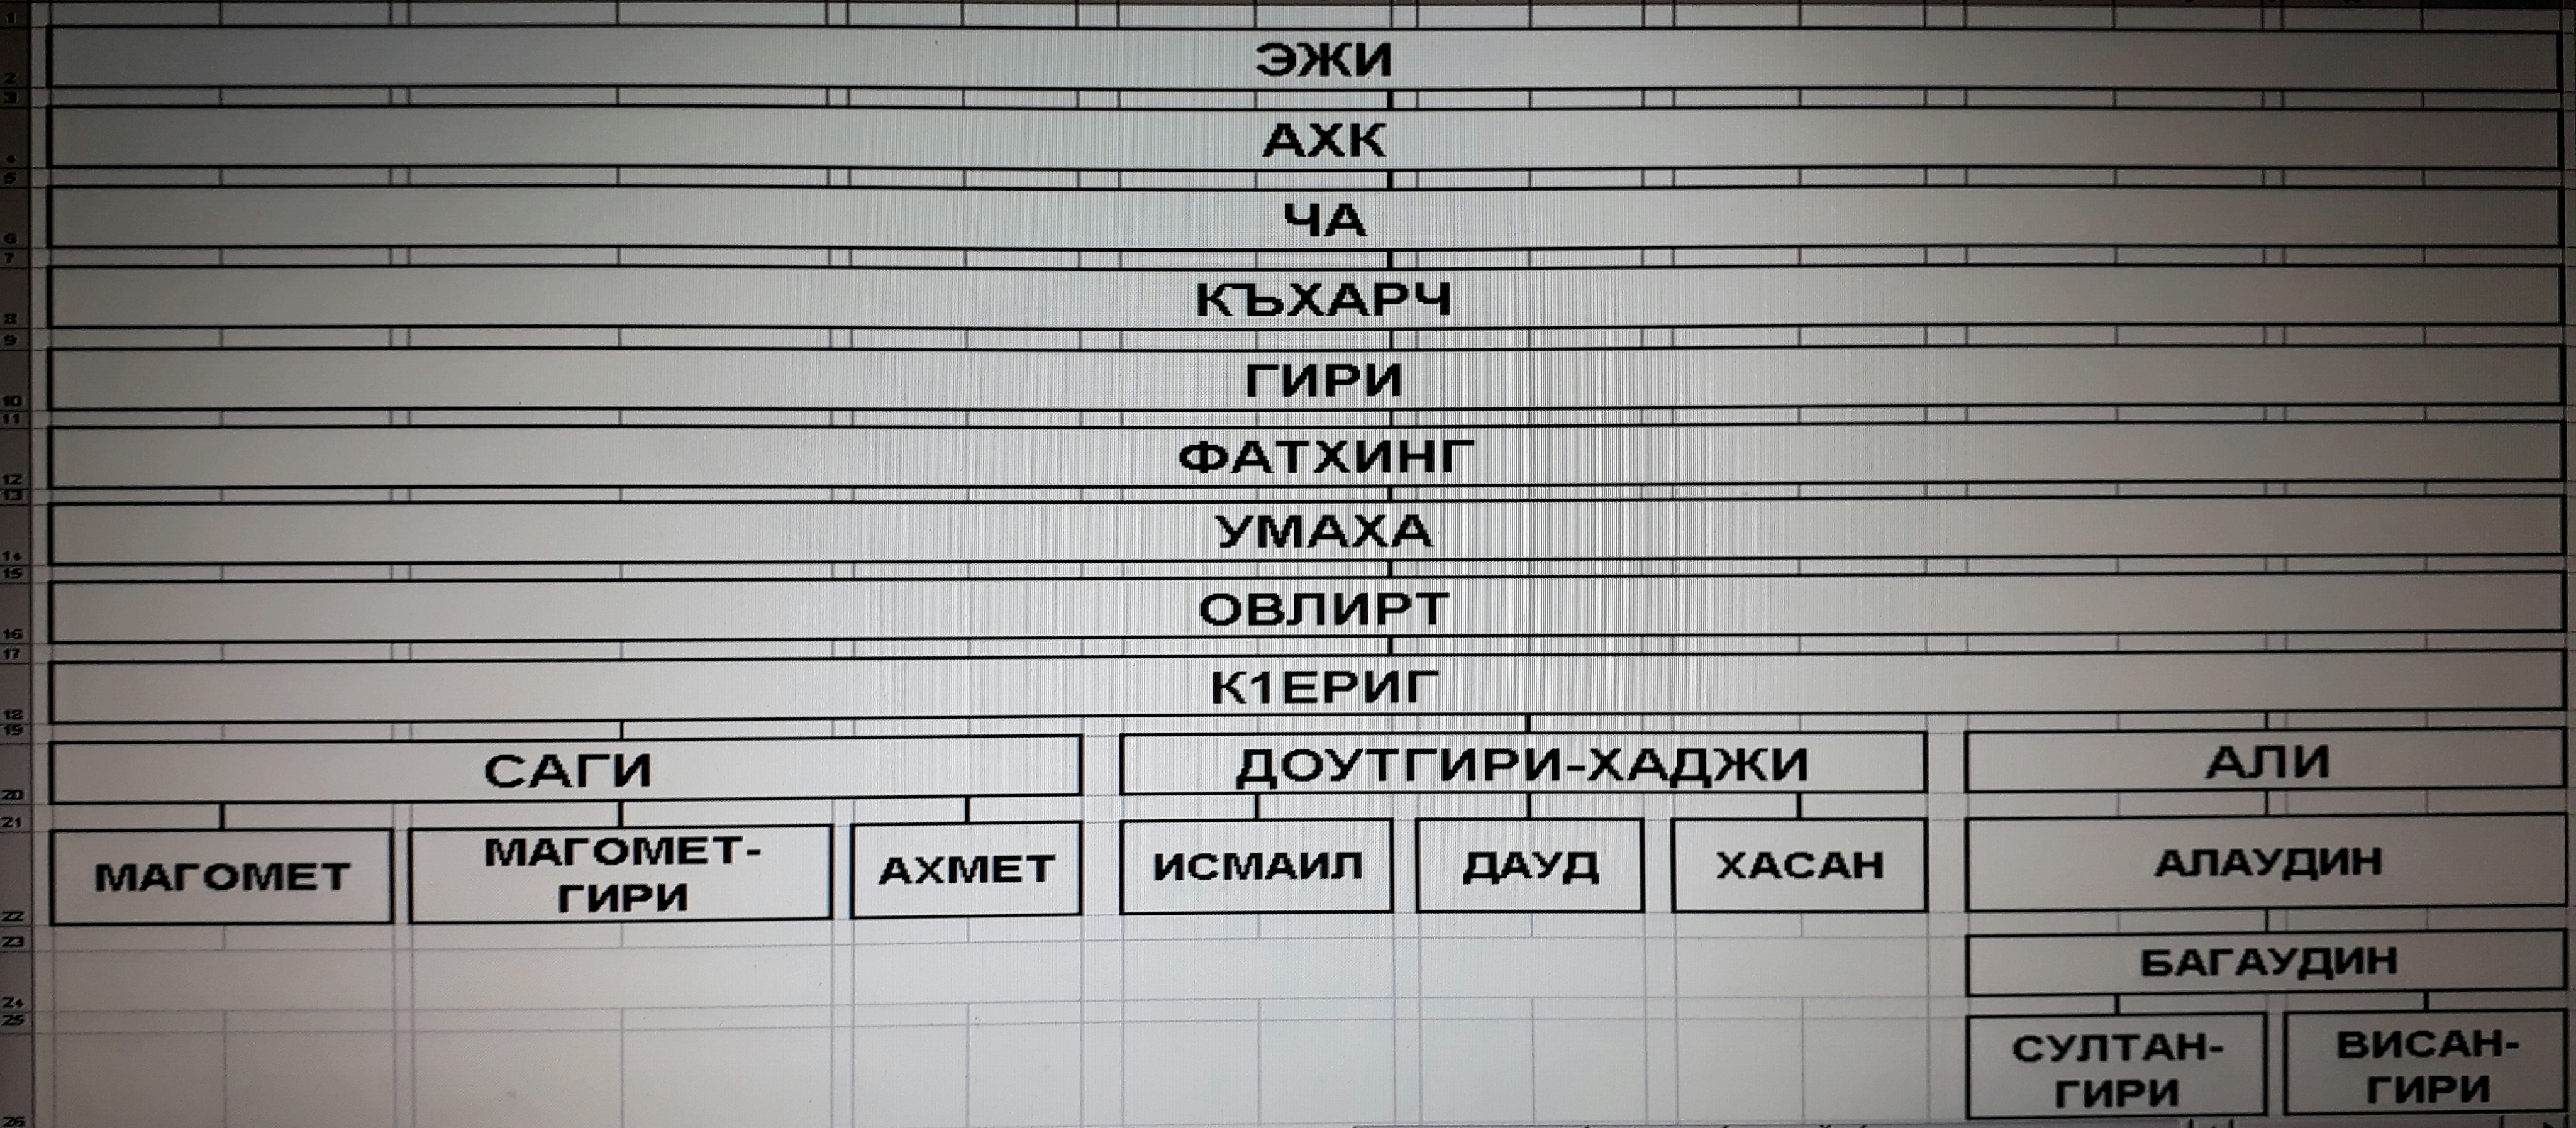 http://s8.uploads.ru/oJUgZ.jpg